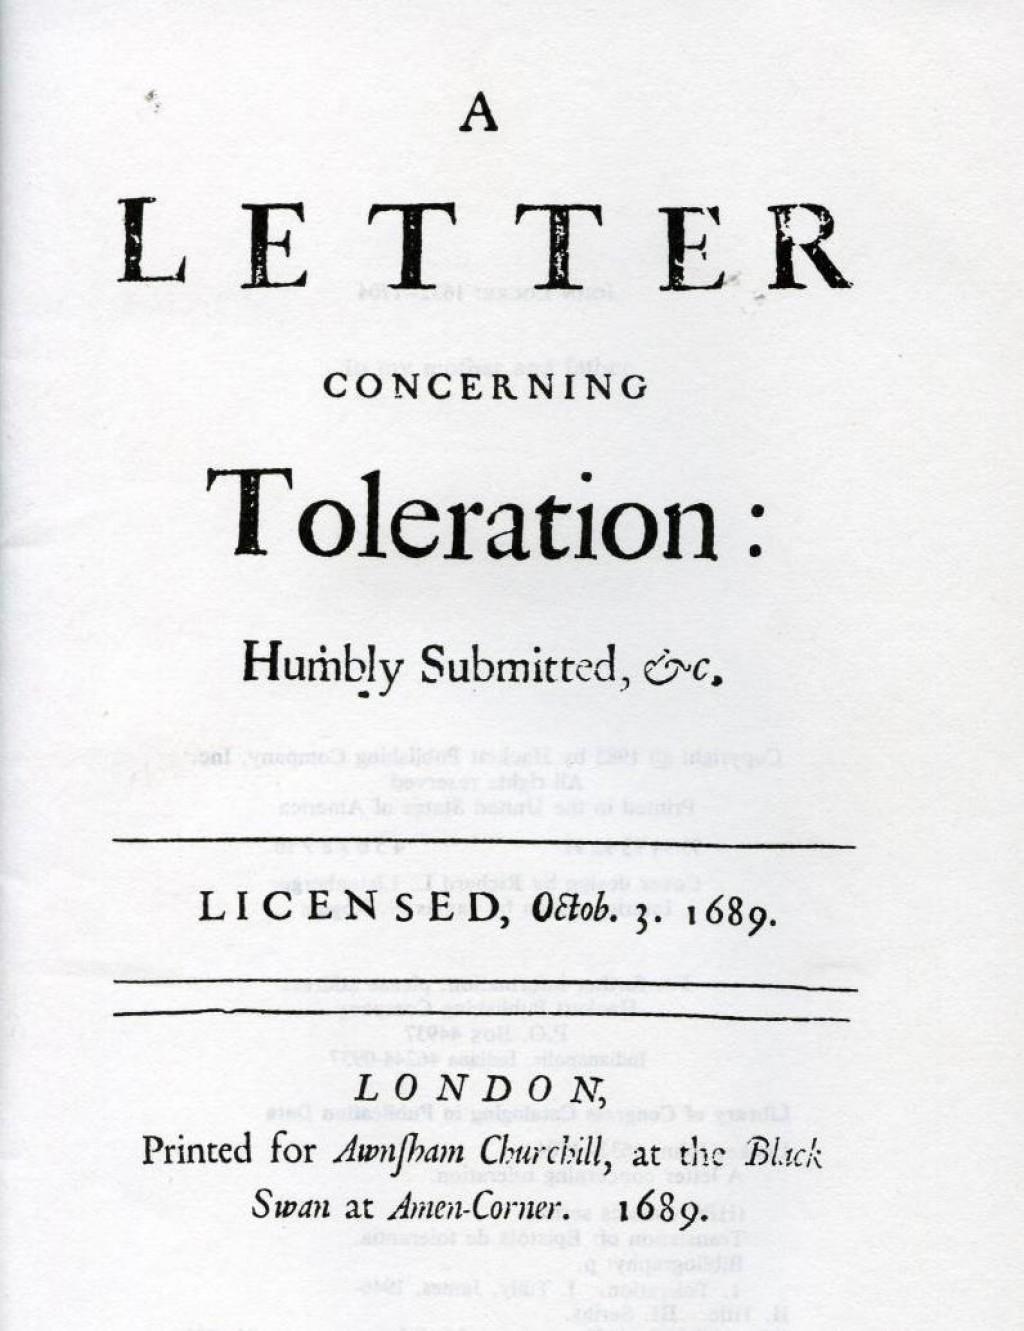 005 John Locke Essay Example Letter Concerning Toleration Impressive Human Understanding Book 4 On Pdf Summary Large